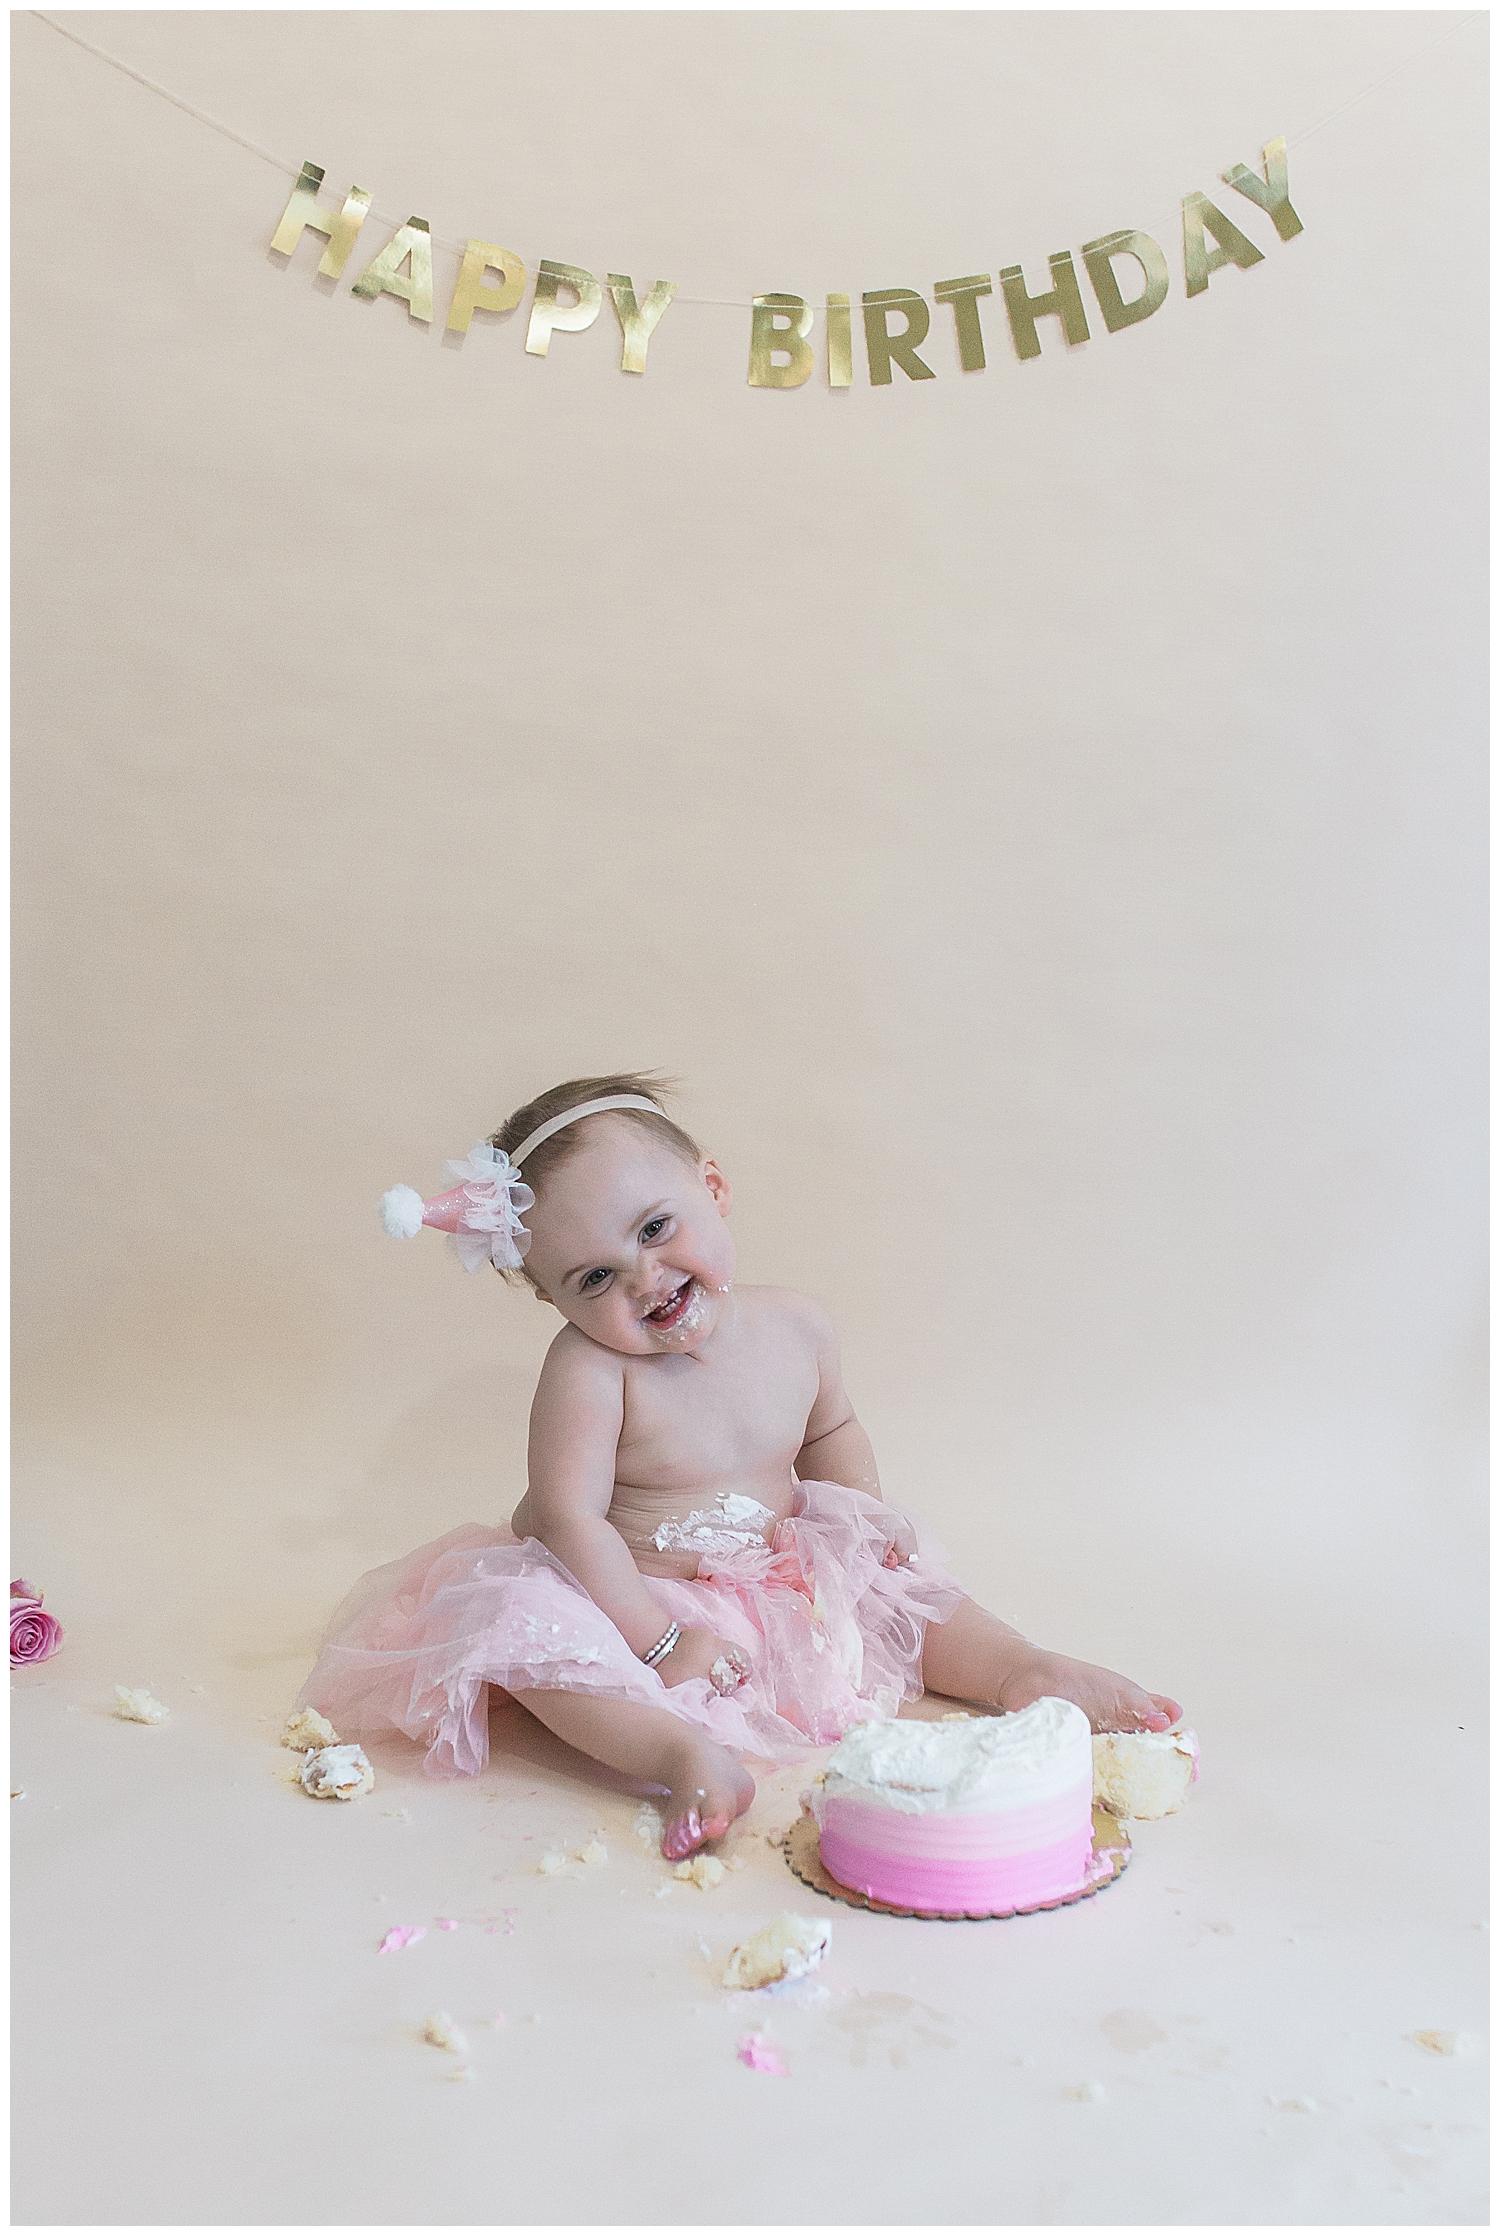 Poppy Lea Photography Orange County Birthdat Photos_0009.jpg